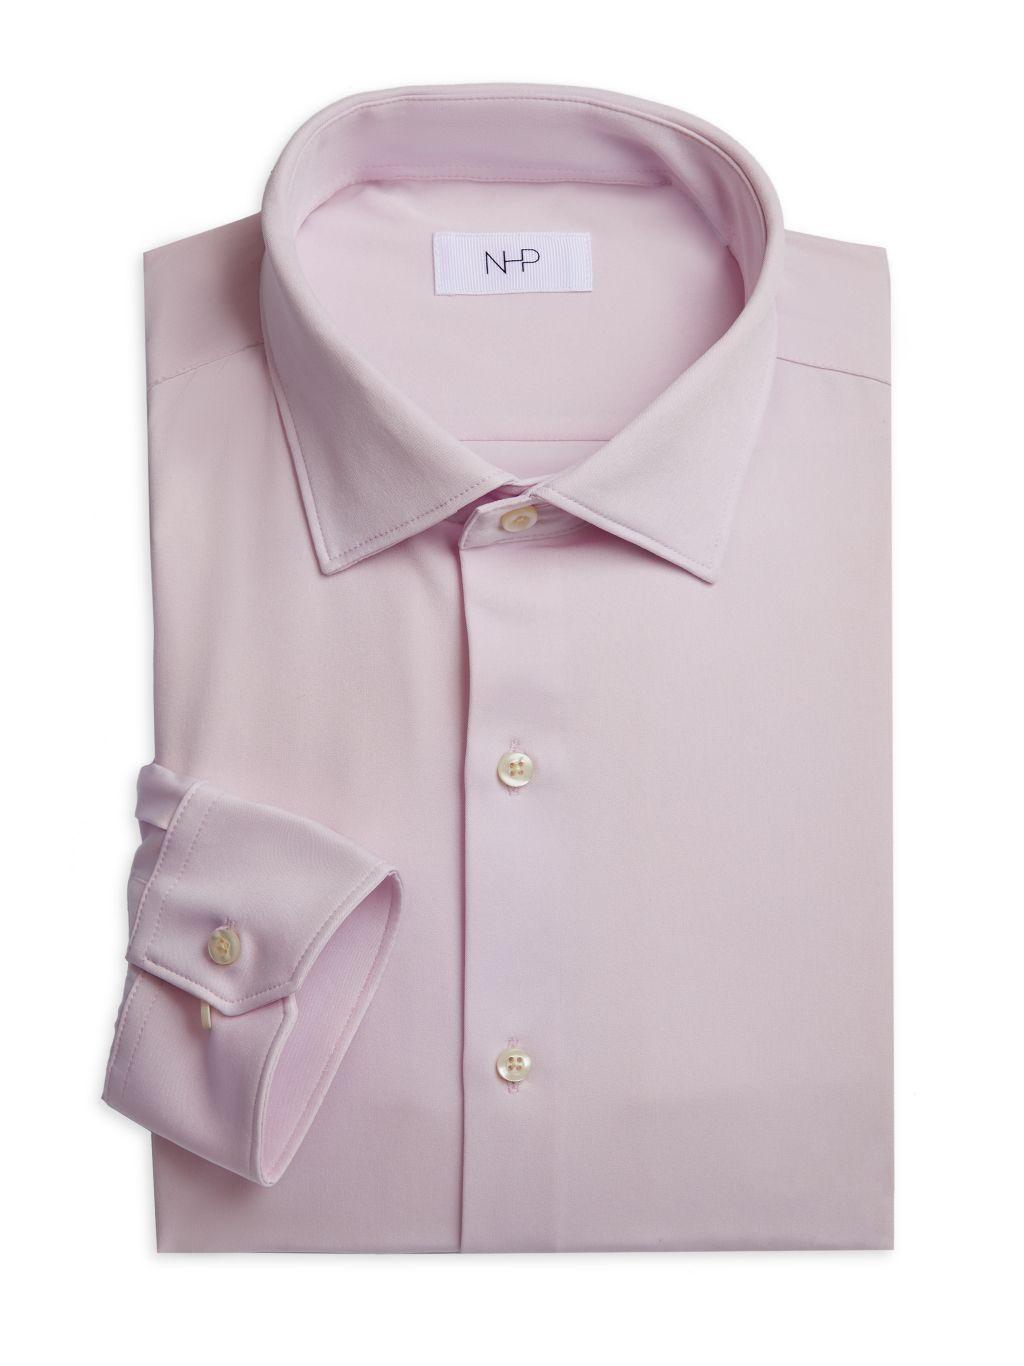 NHP Trim-Fit Dress Shirt